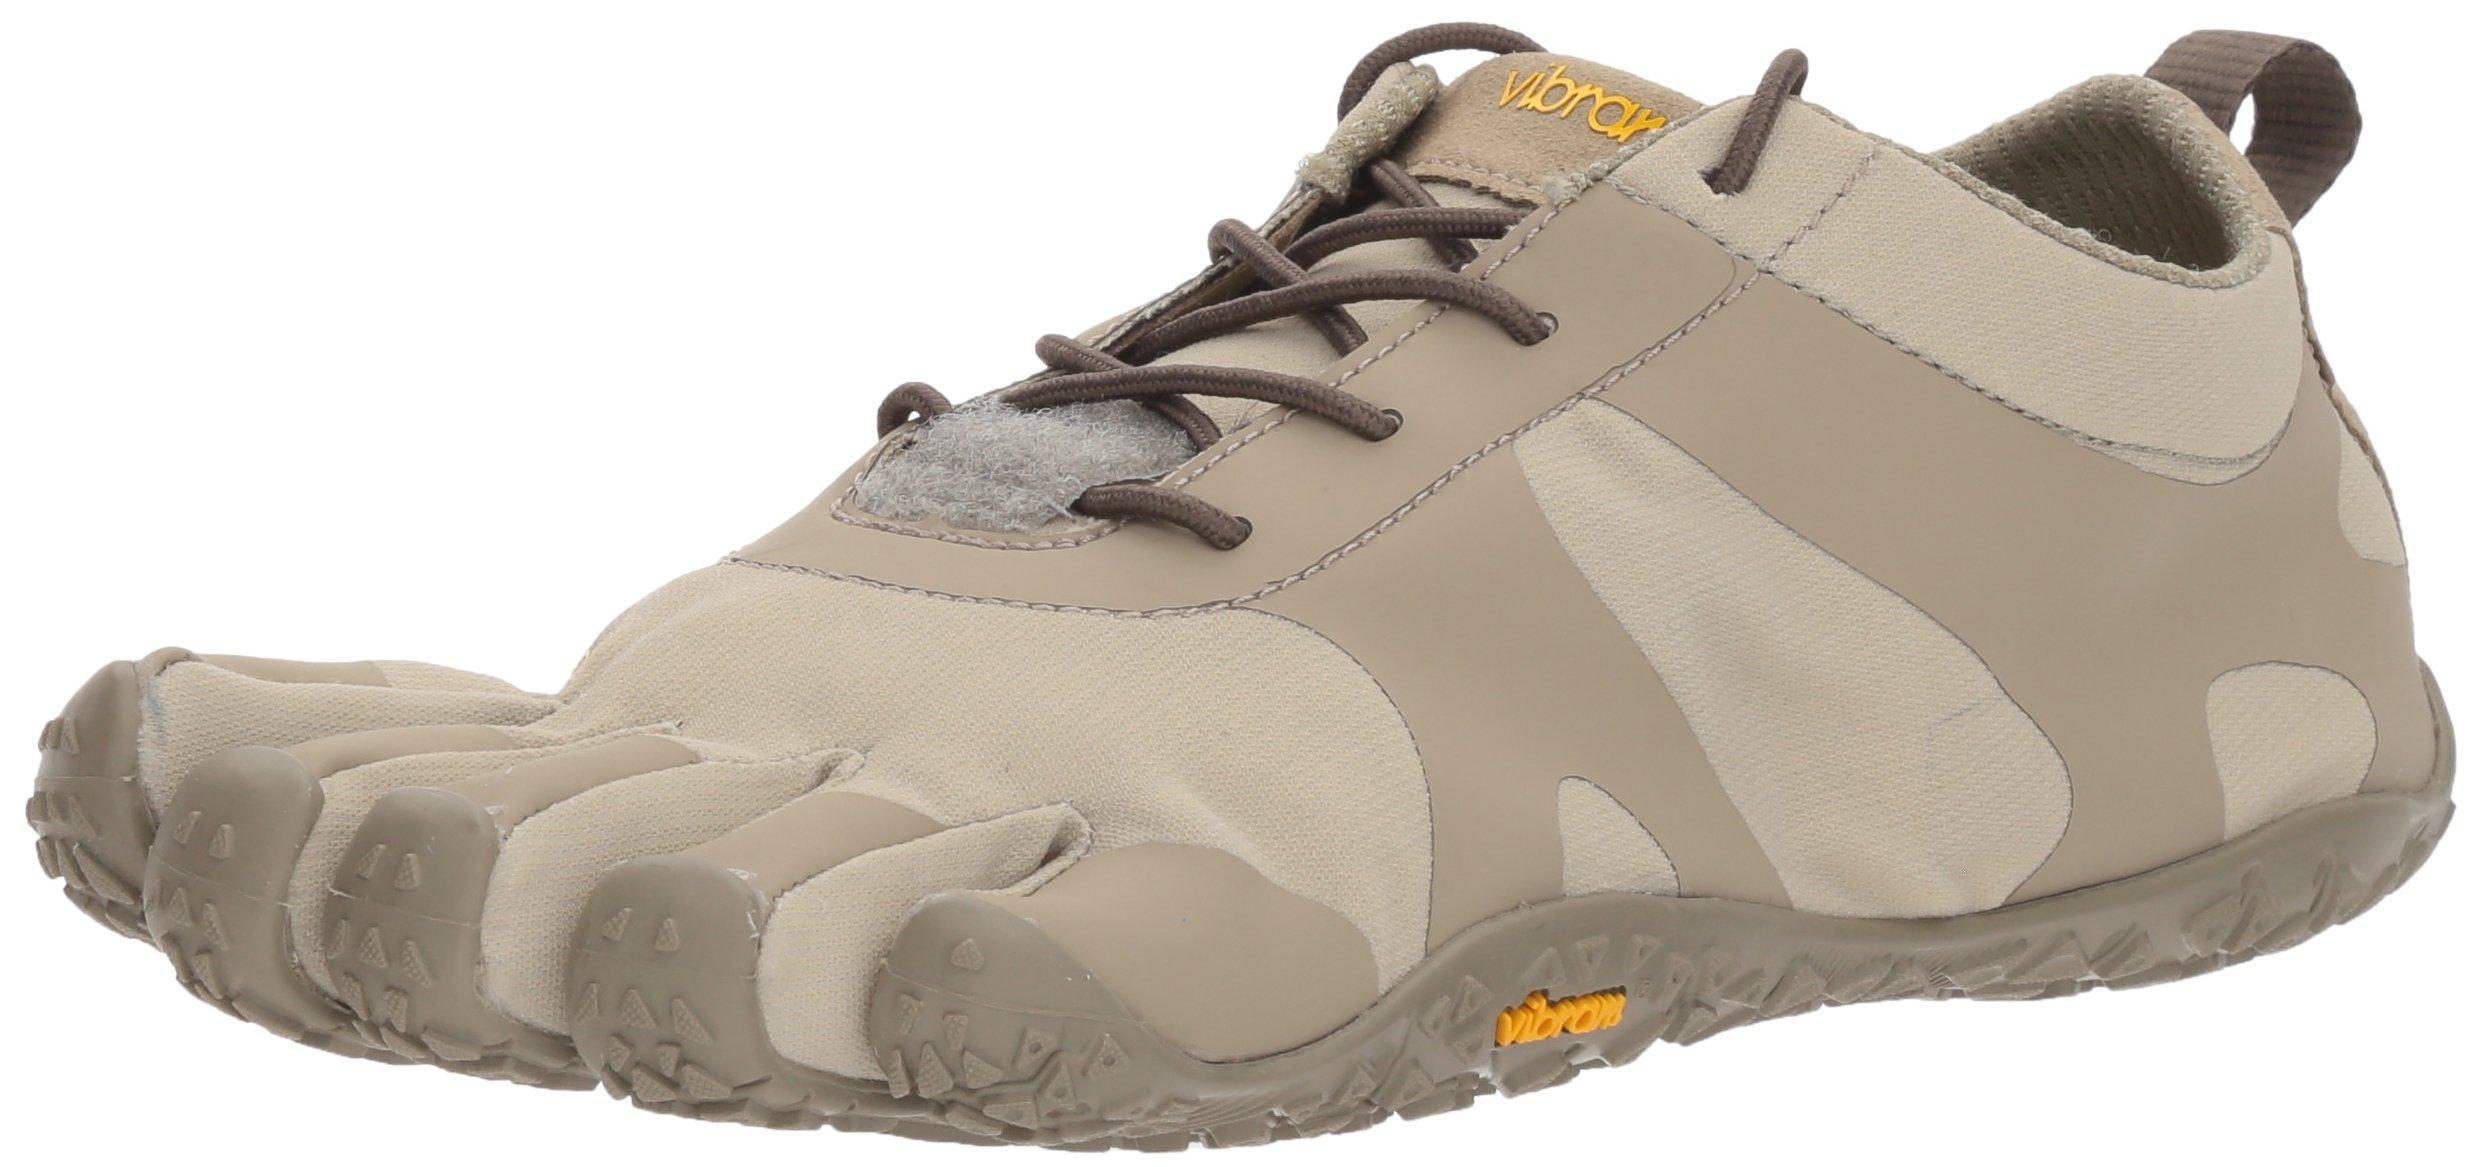 Vibram Women's V-Alpha Hiking Shoe, Sand/Khaki, 41 EU/8.5-9 M US B EU (41 EU/8.5-9 US US)